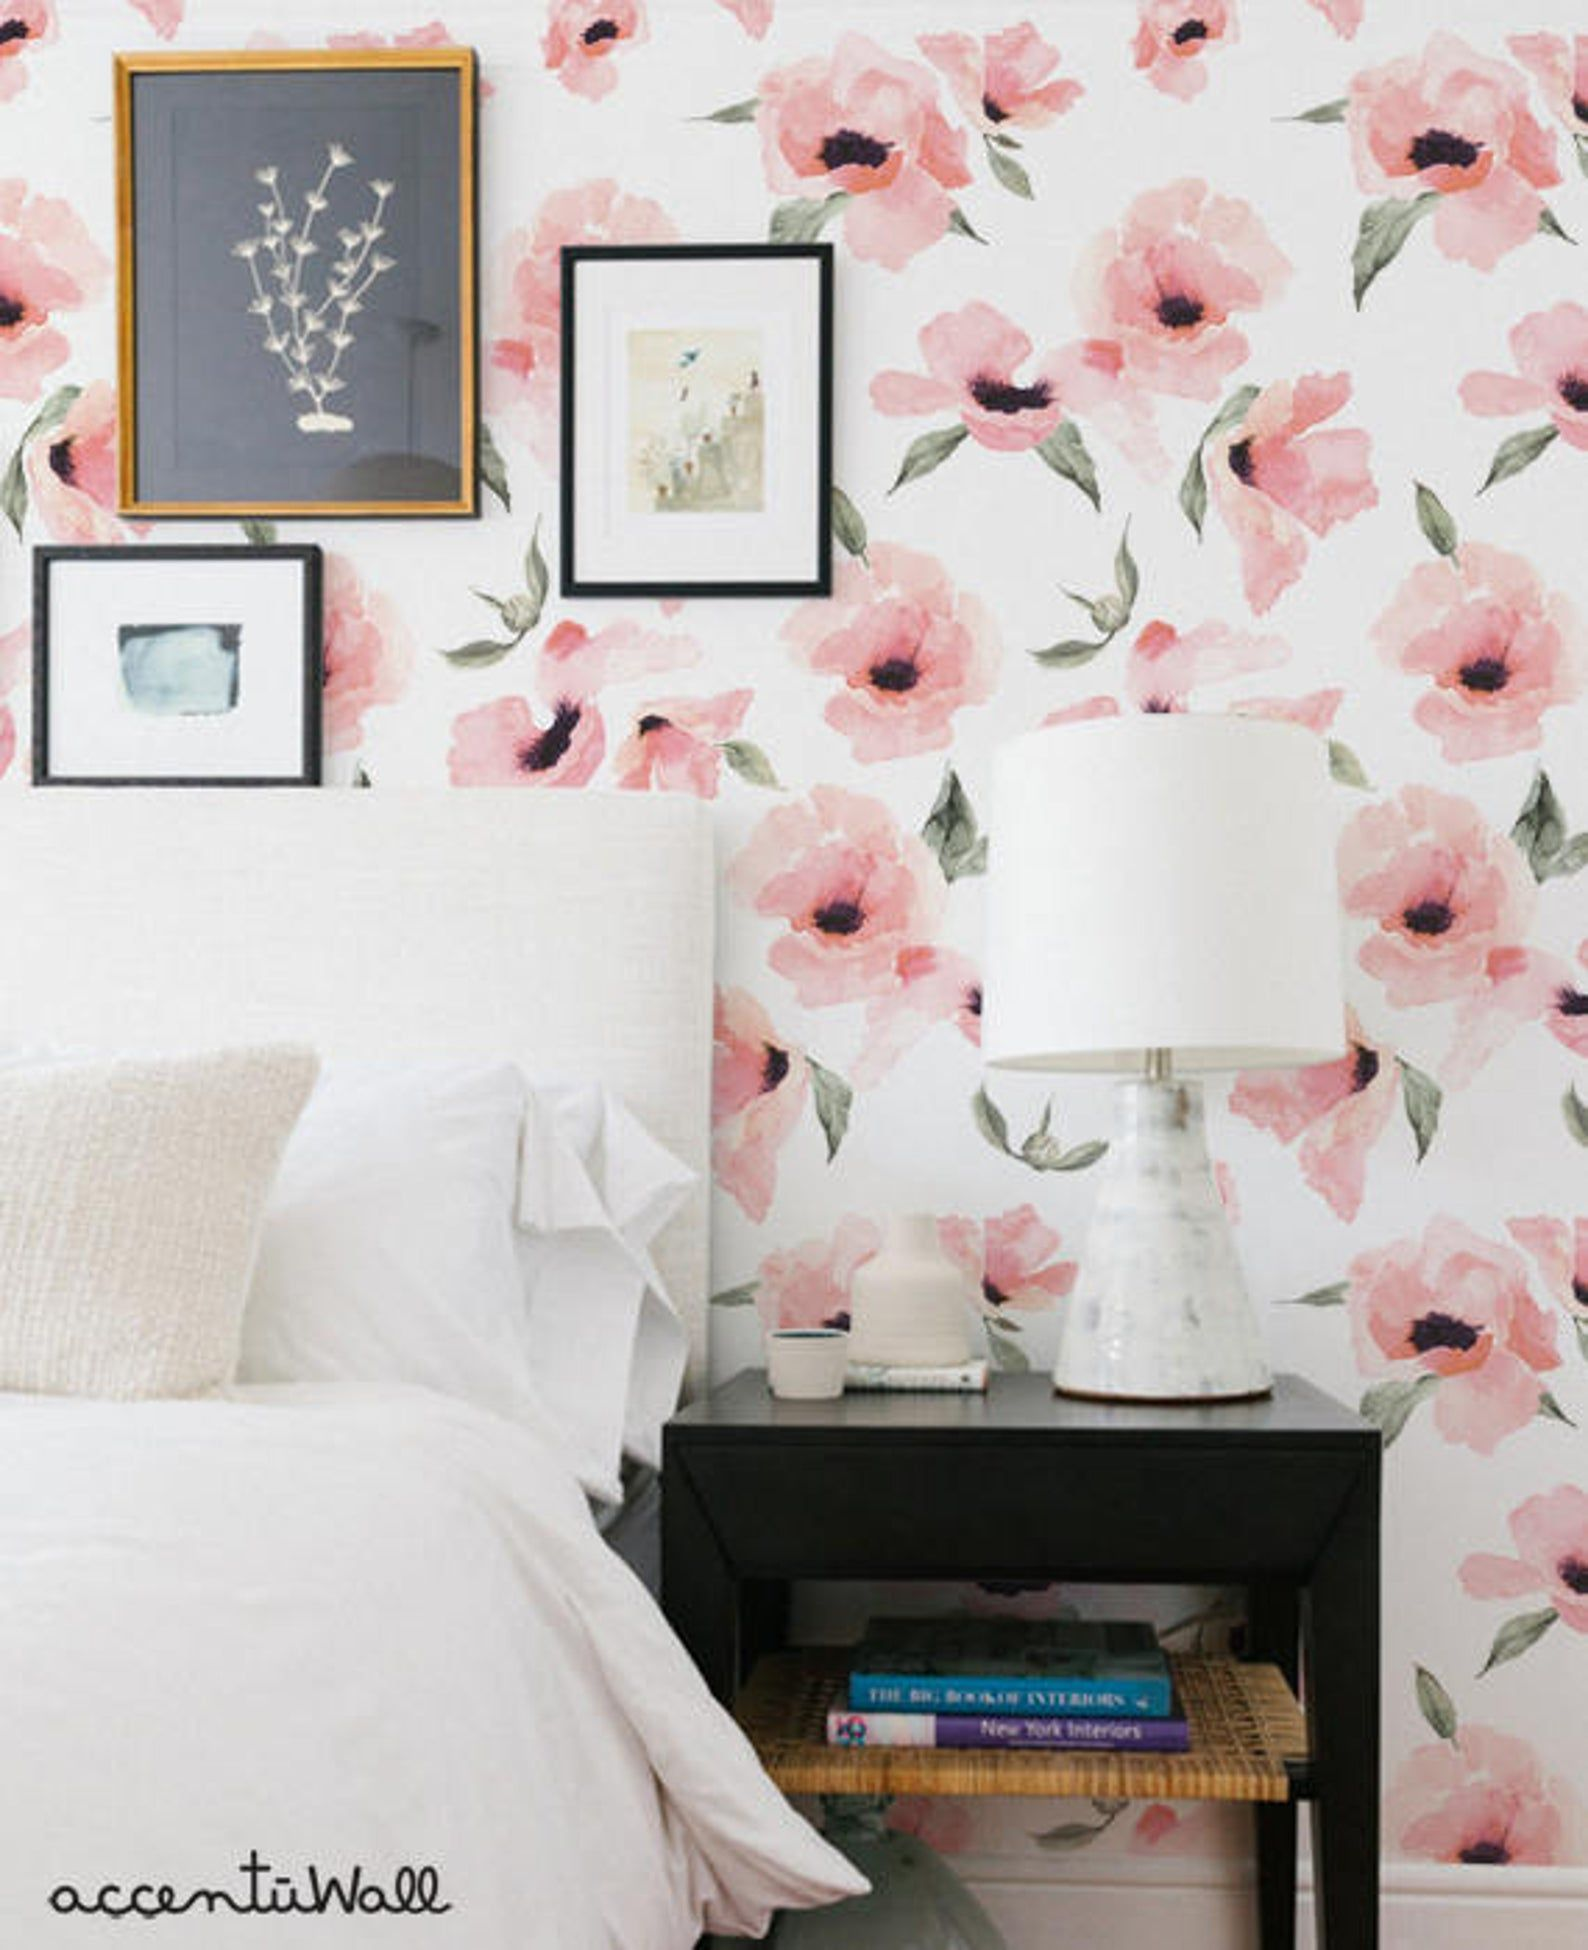 Floral Wallpaper Watercolor Poppy Flowers Pink Peel ...